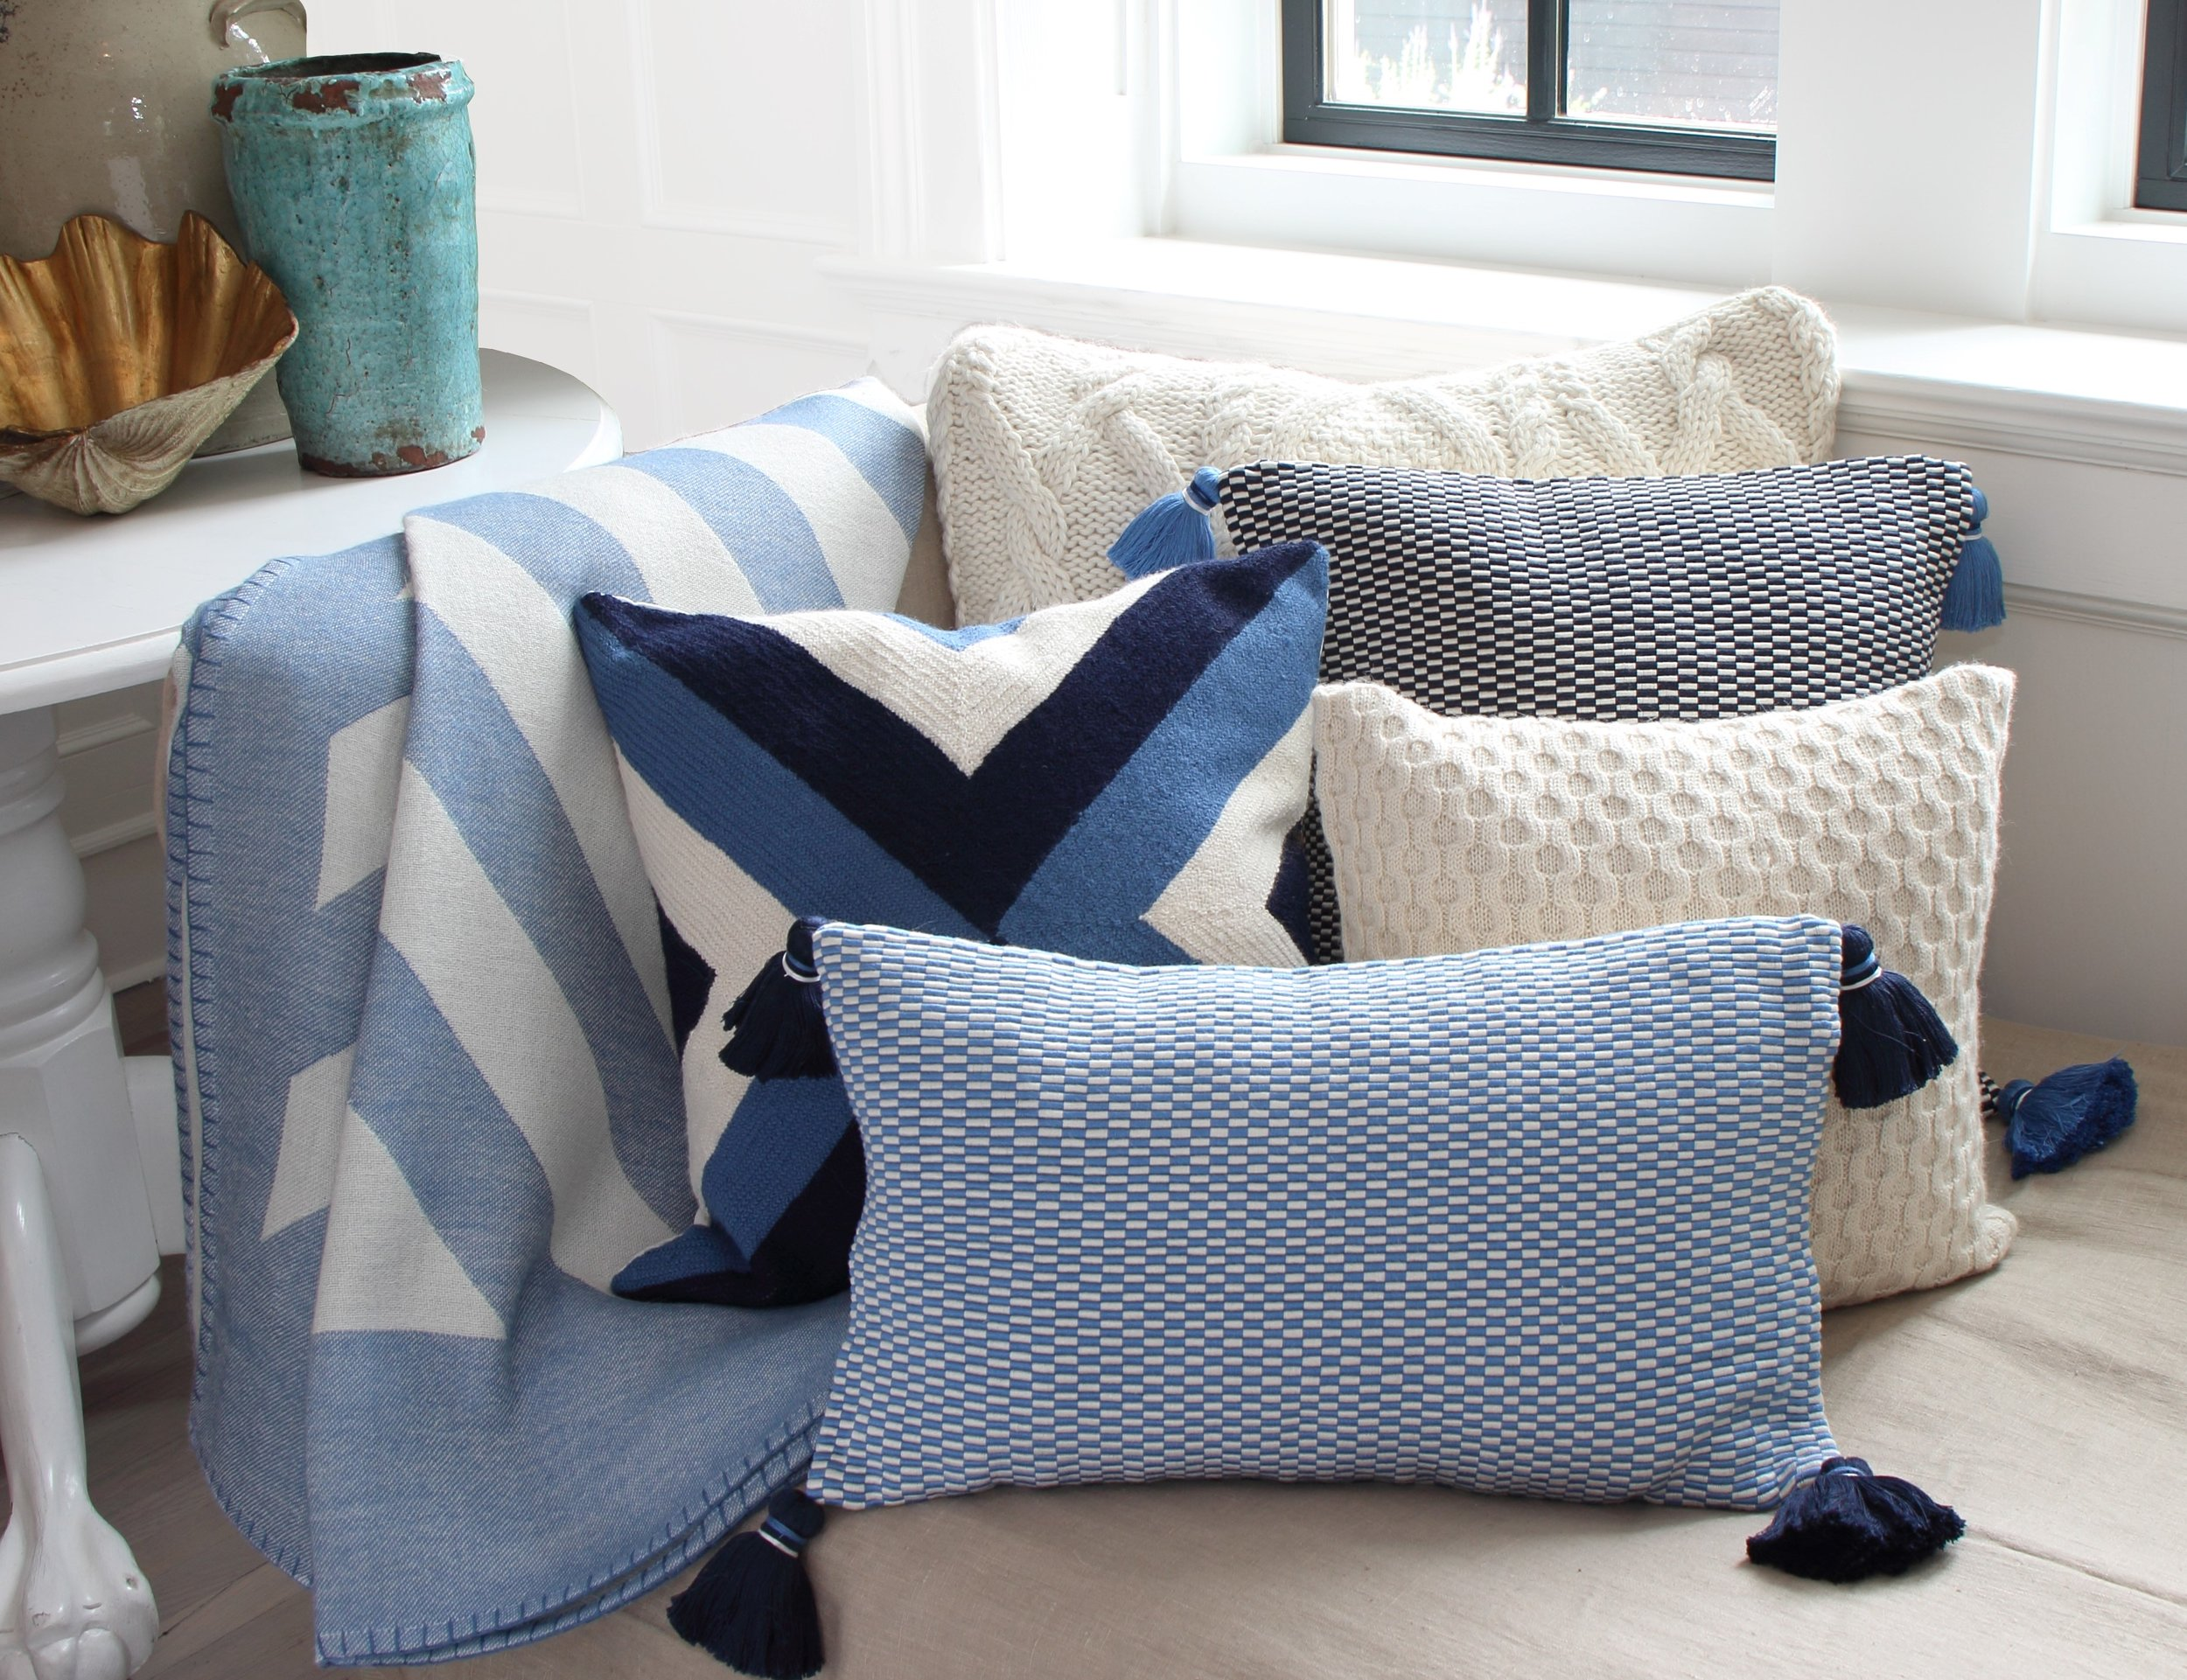 Johanna Howard 1)Grinda Blues Throw Pillow Etc_LT Window - Copy.jpg